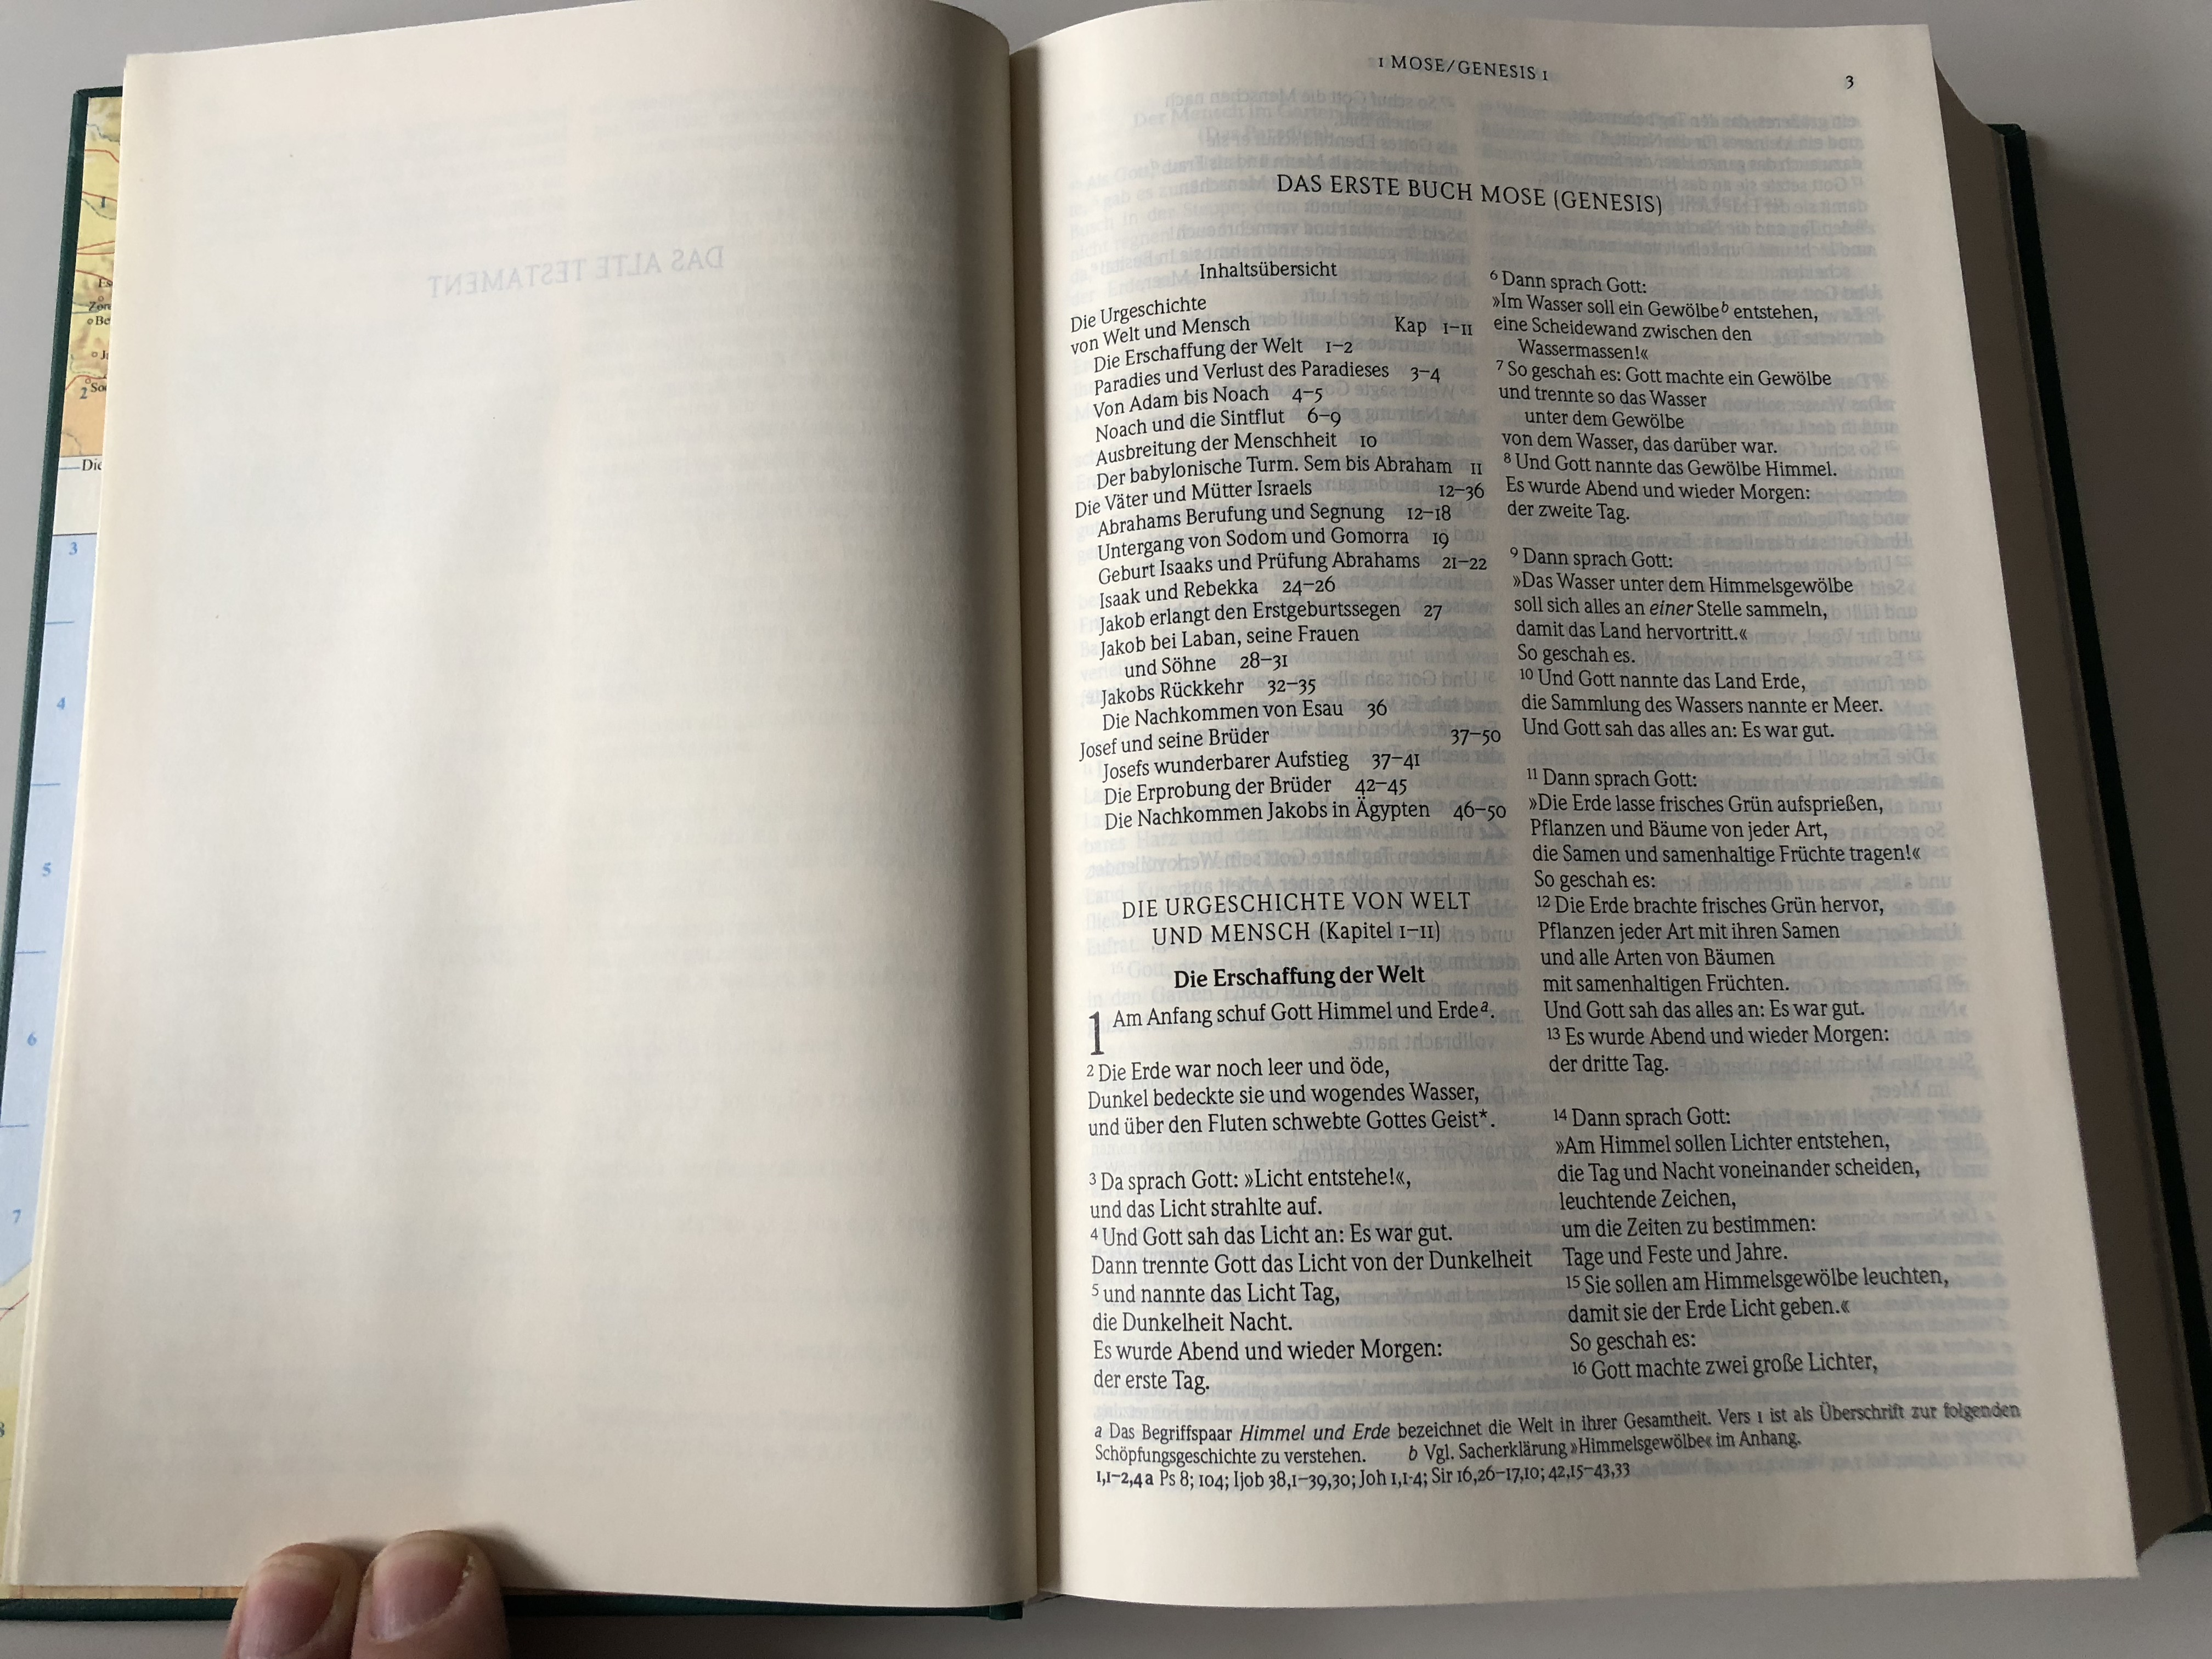 gute-nachricht-bibel-today-s-german-holy-bible-8-.jpg